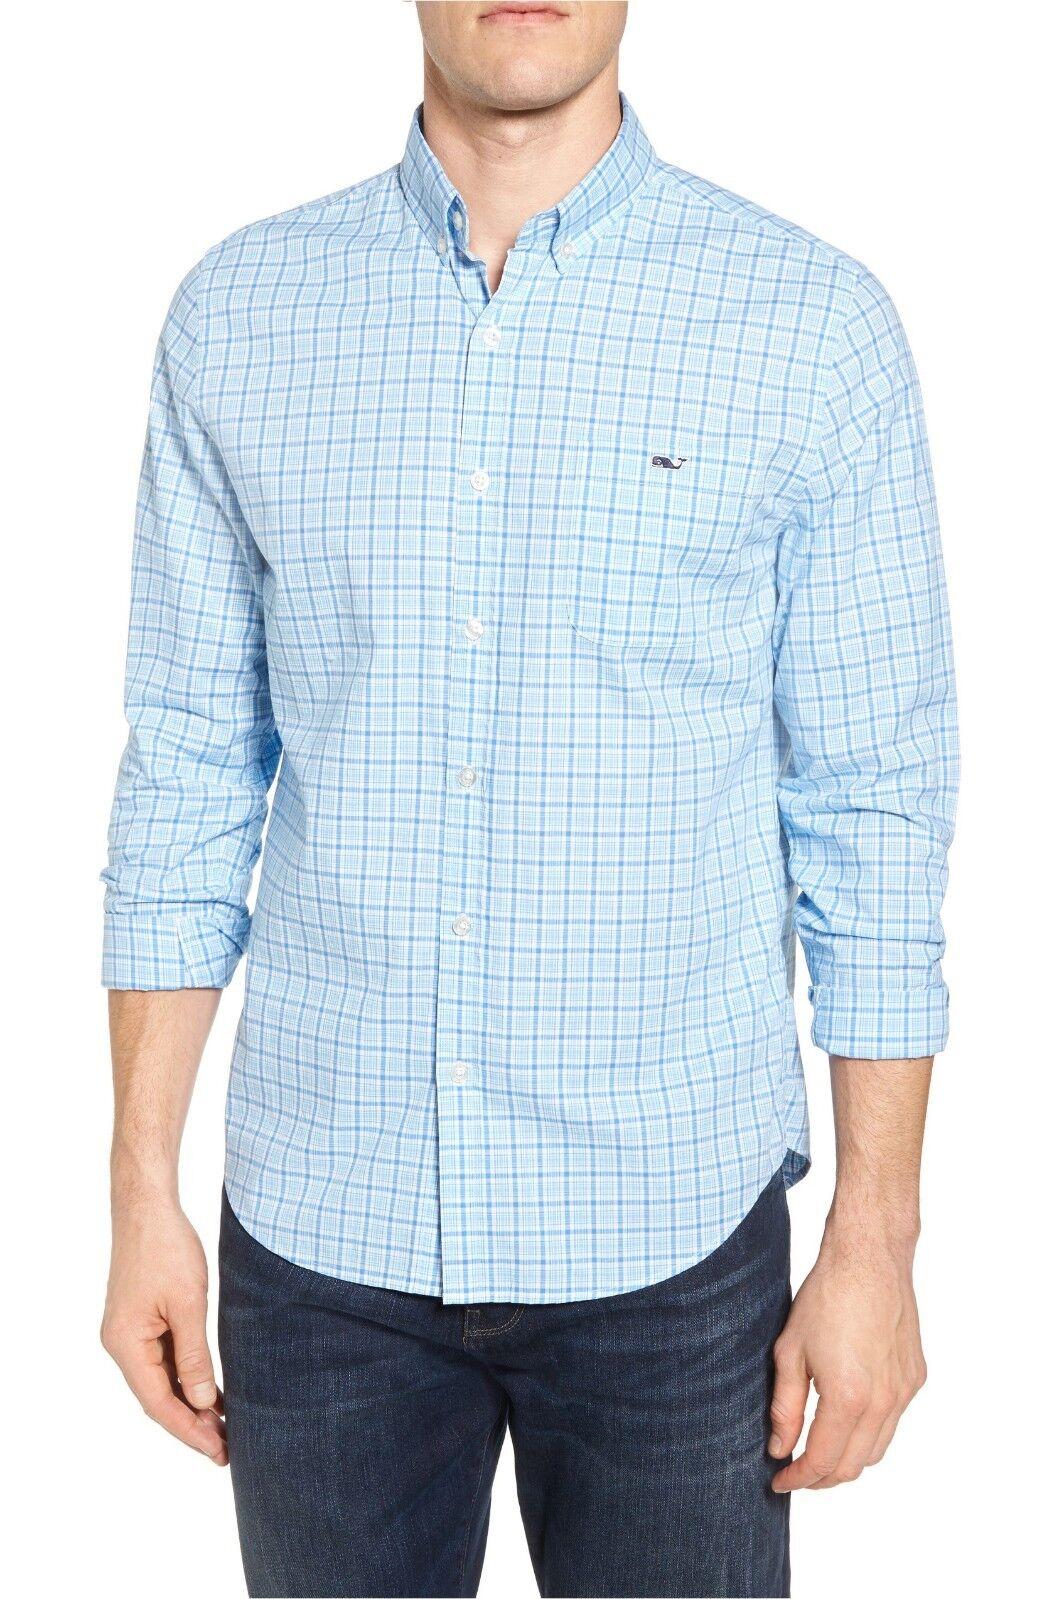 Vineyard Vines Men's Seawatch Slim Fit Plaid Sport Shirt